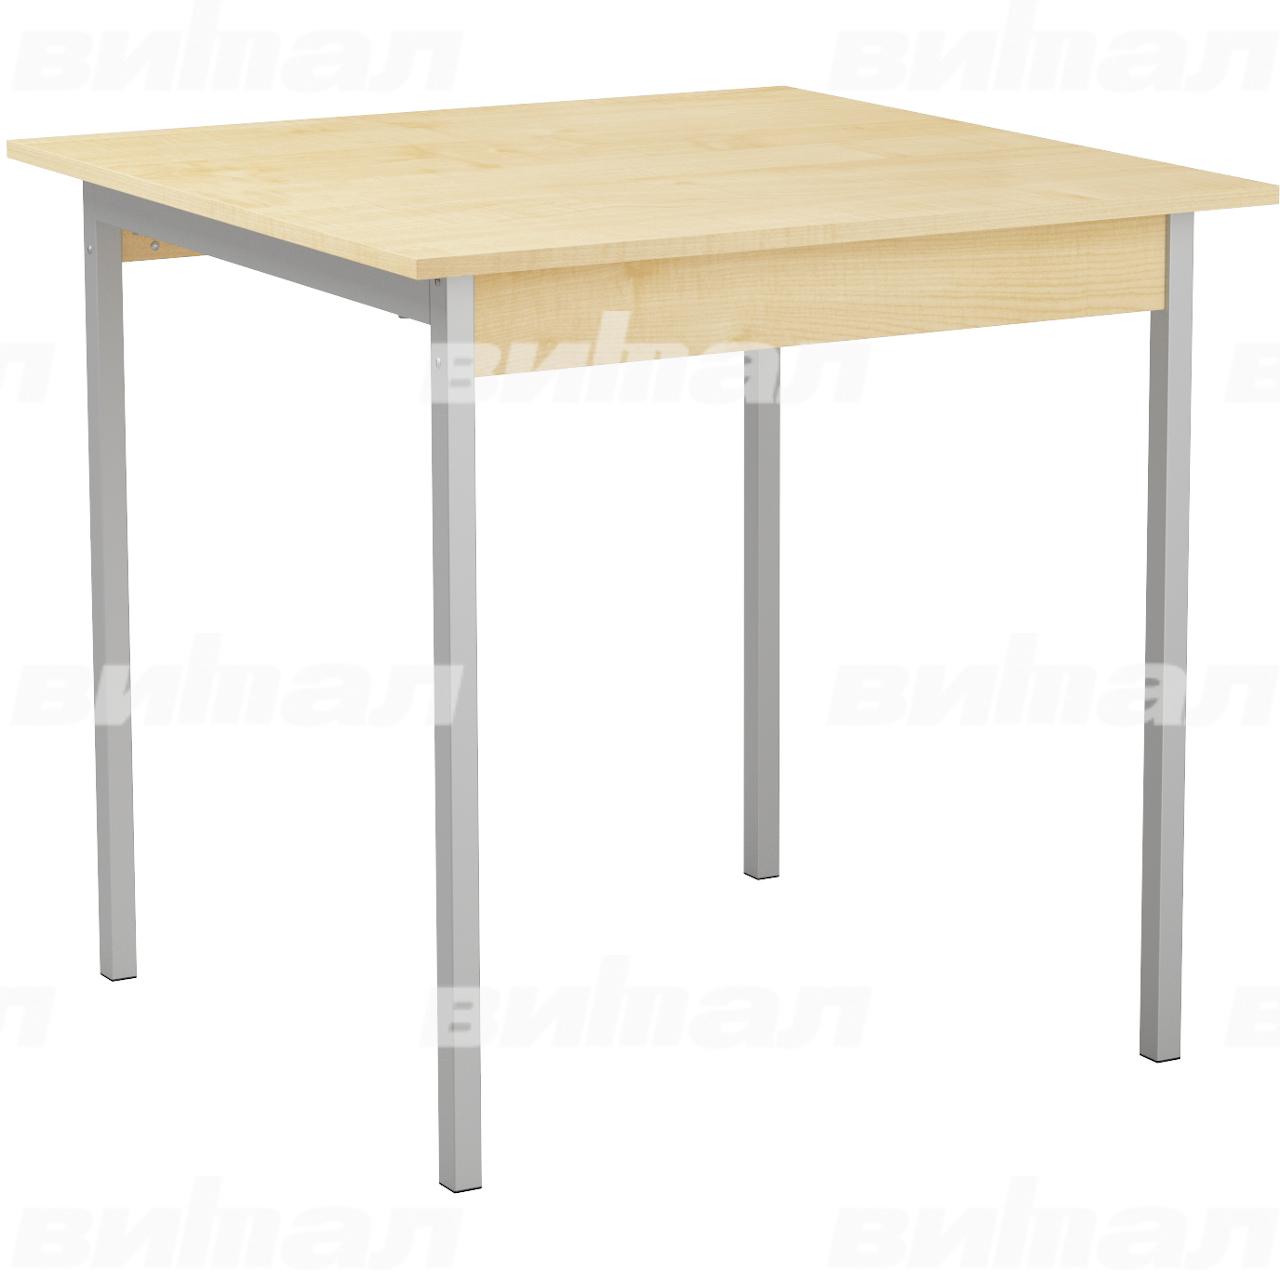 Стол для столовой для 4 табуретов серый Клен Пластик